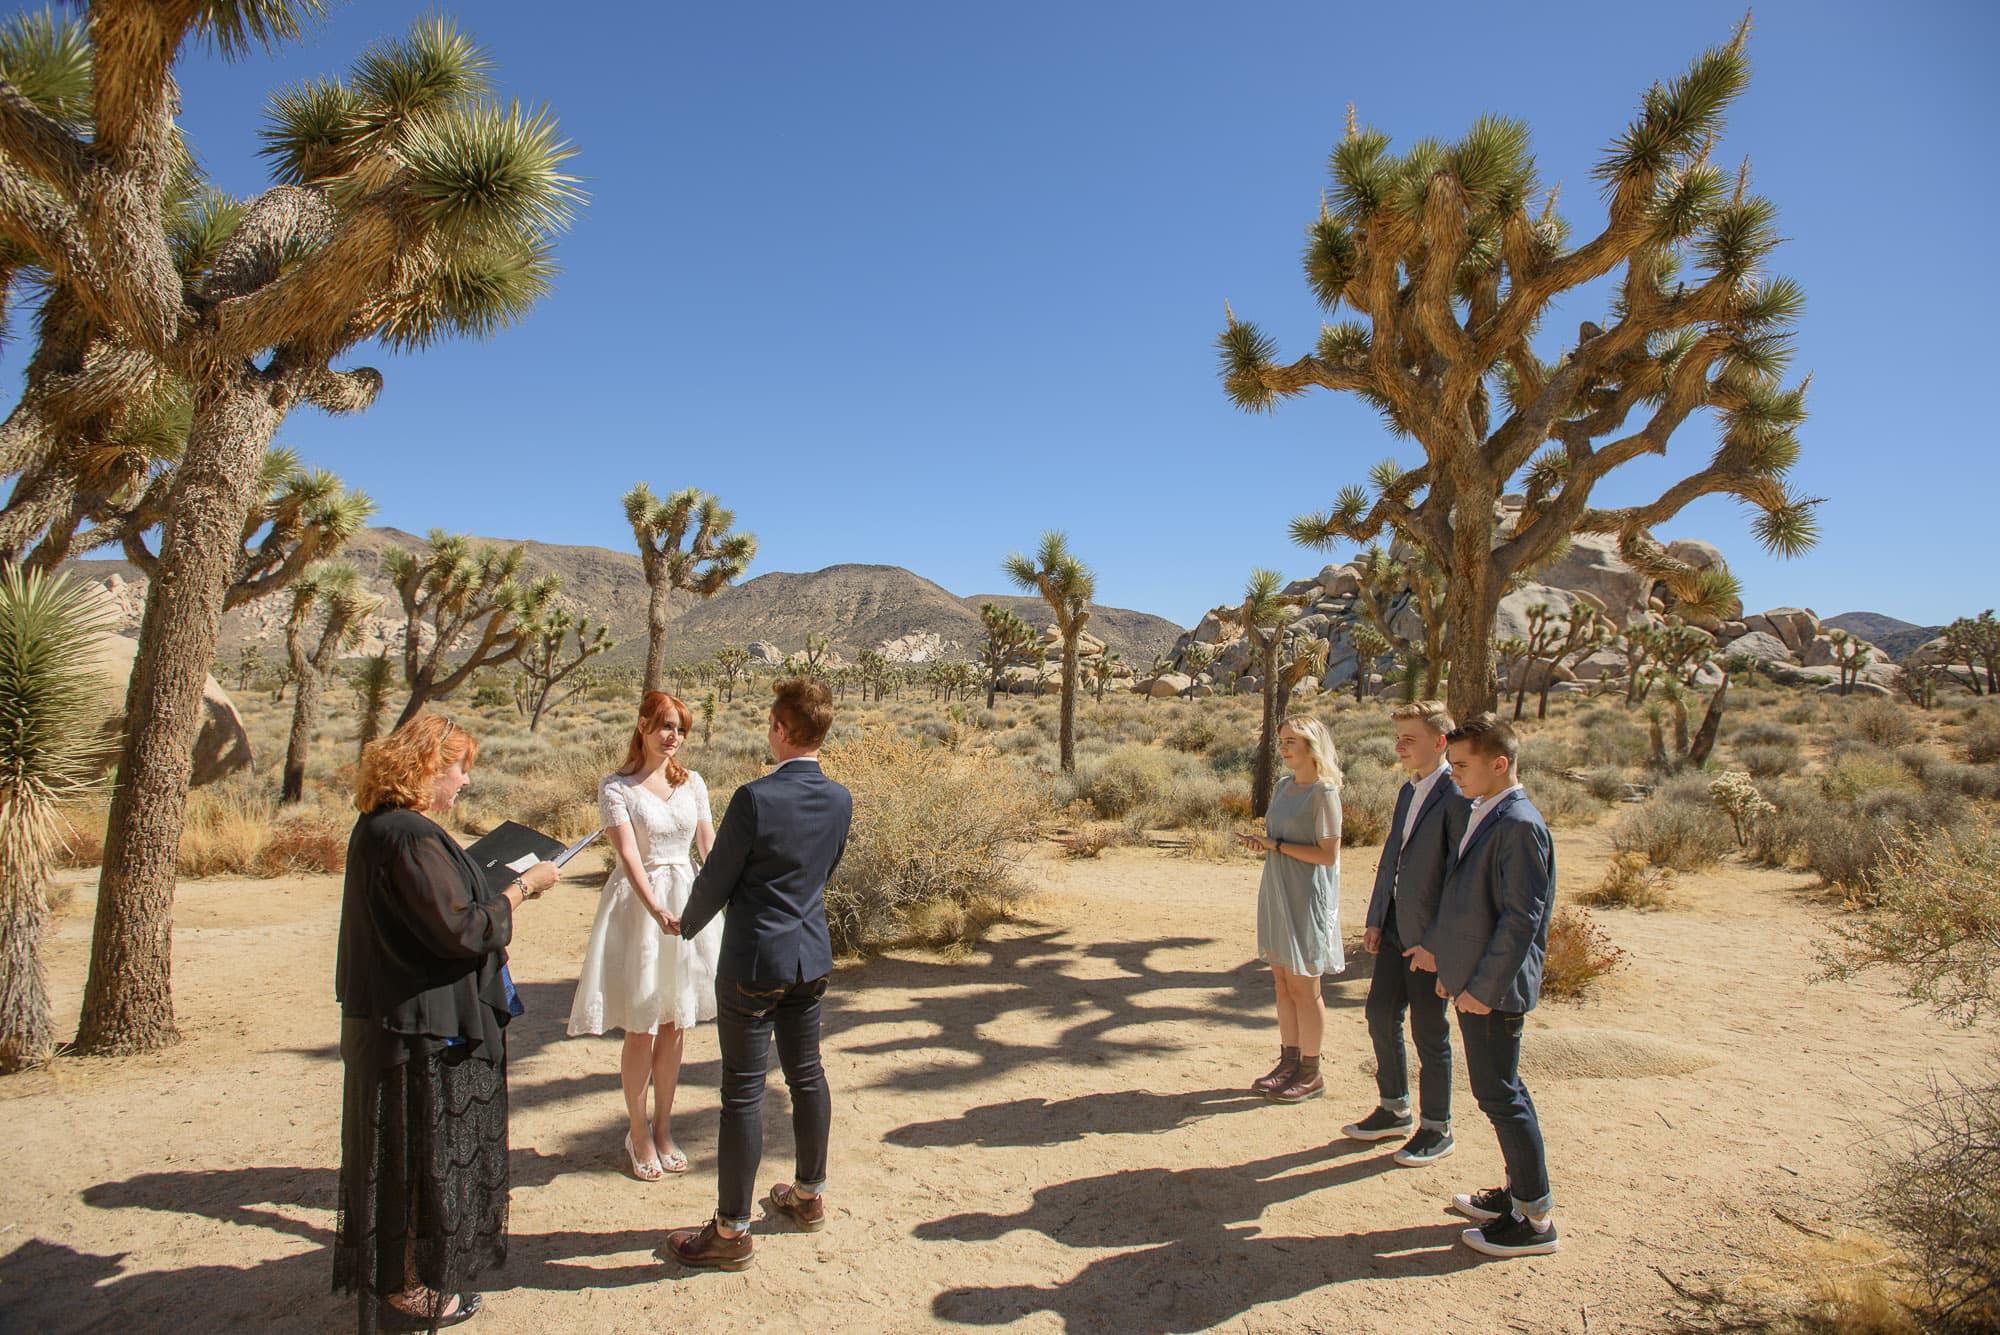 005_Alan_and_Heidi_Joshua_Tree_Destination_Wedding